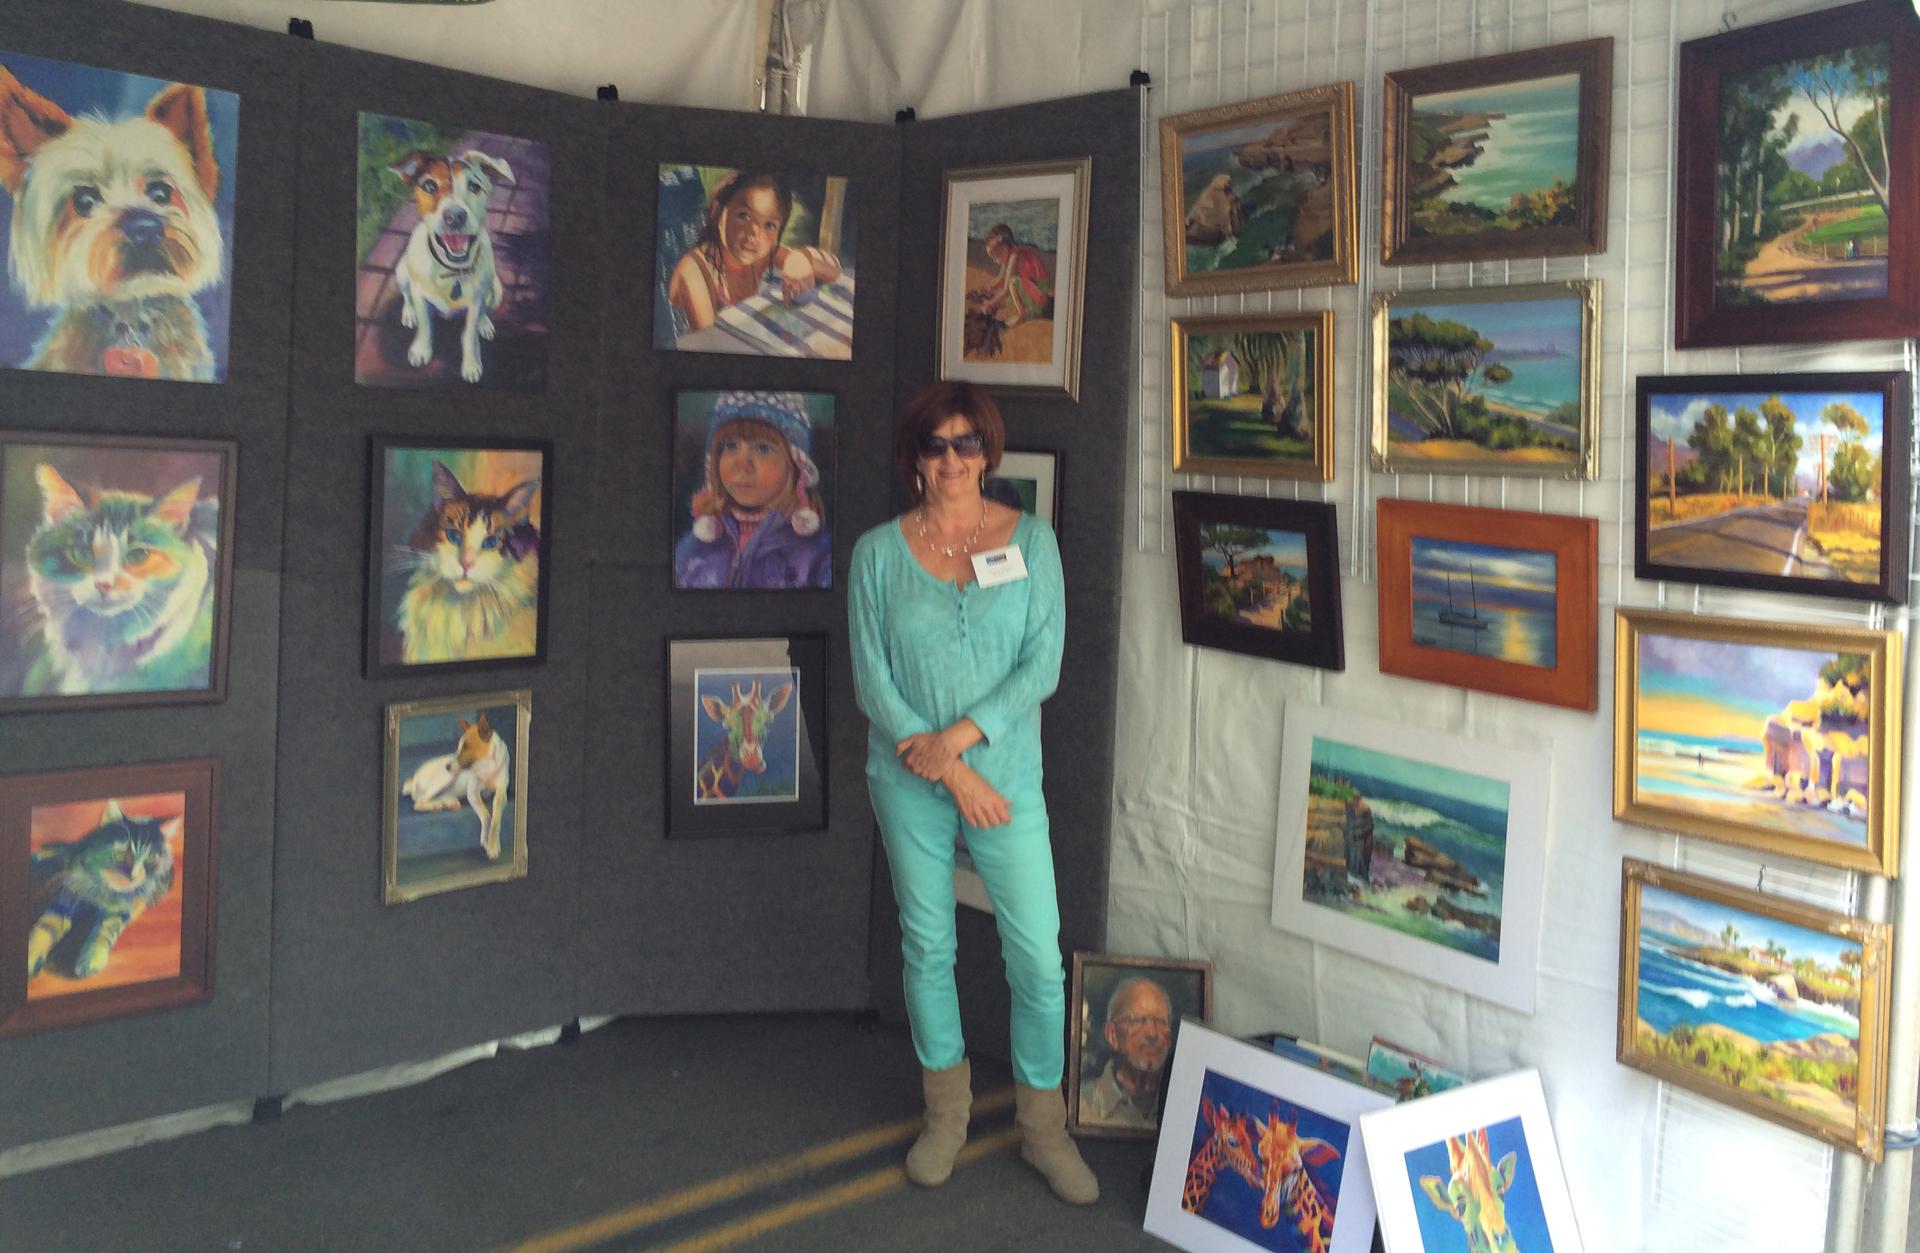 Deirdre at Art Walk 2014